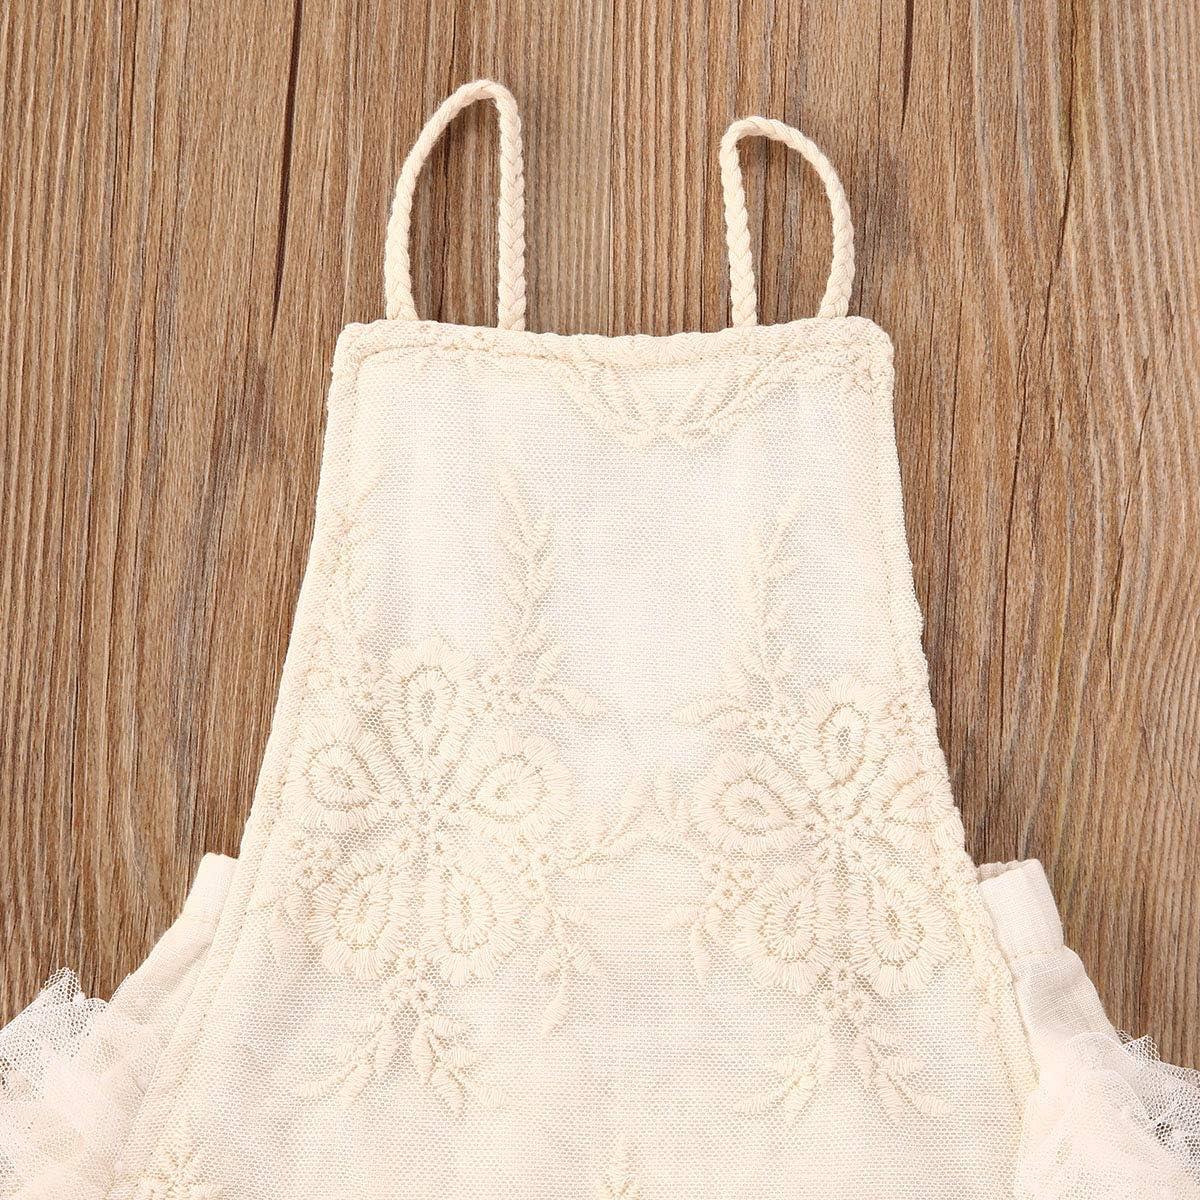 Newborn Infant Baby Girls Ruffle Sleeve Romper Bodysuit Lace Tutu Dress Jumpsuit Outfits Clothes